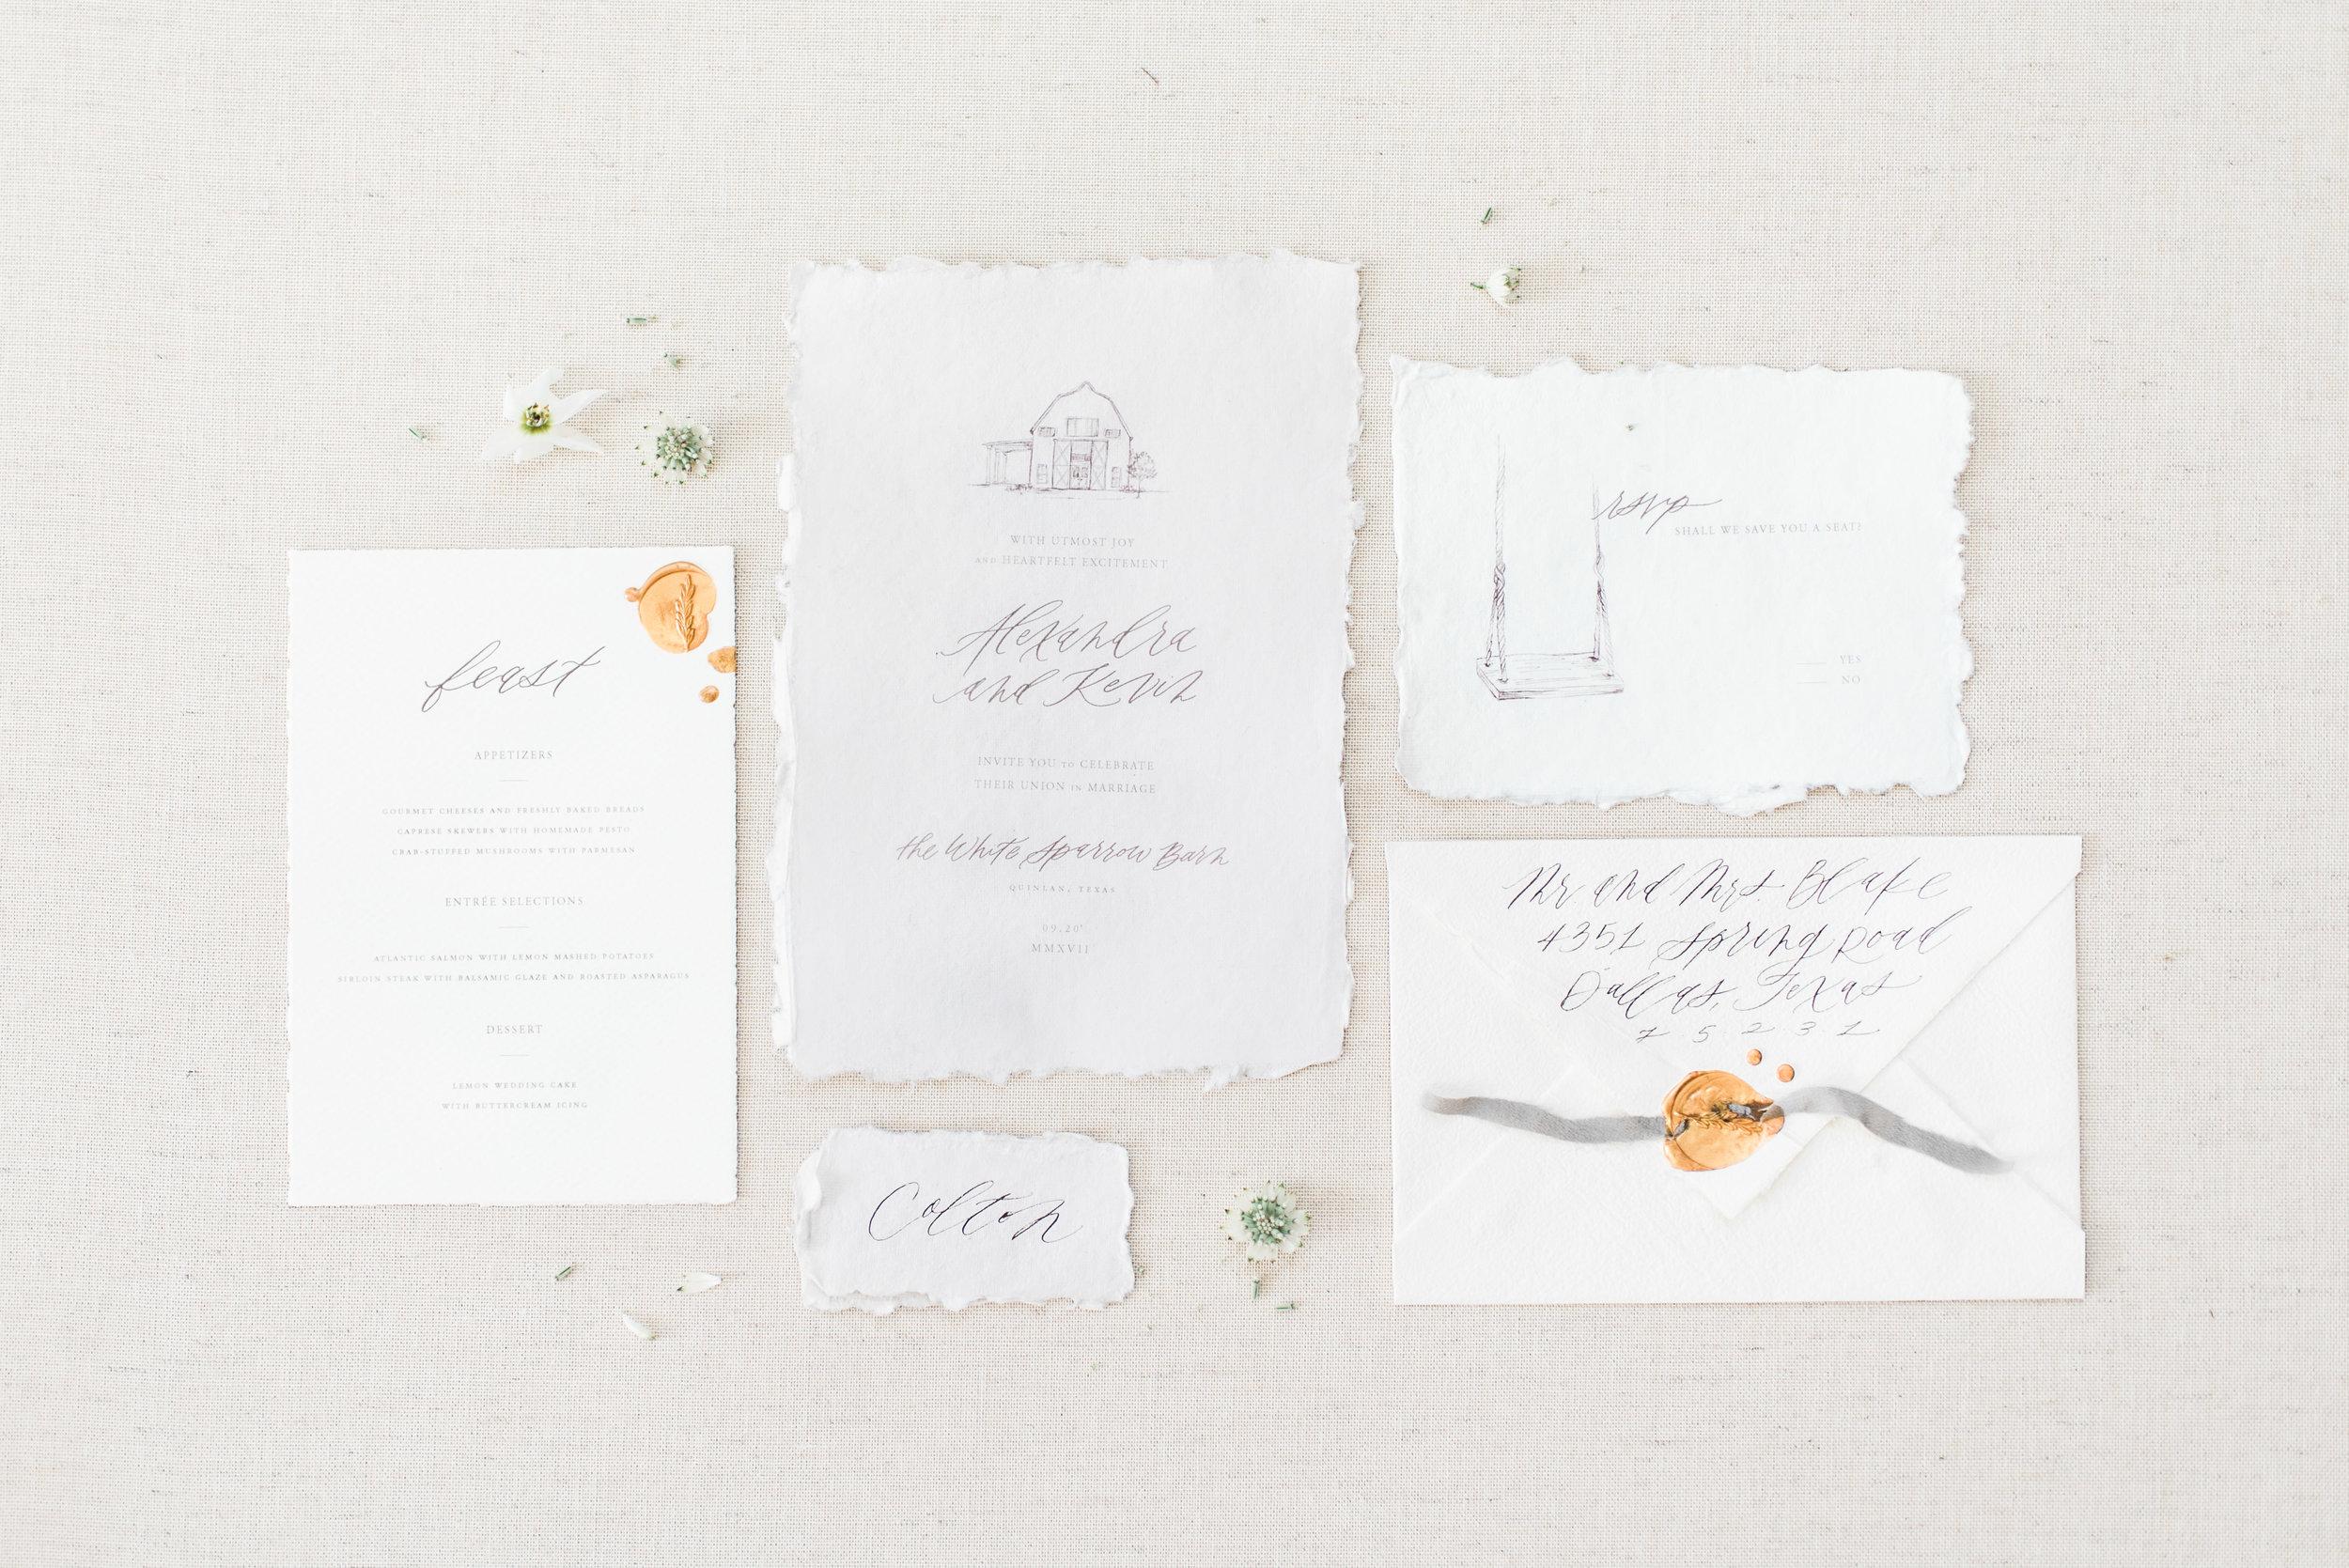 gray-door-photography-wedding-photographer-steph-erffmeyer-dallas-destination25.jpg